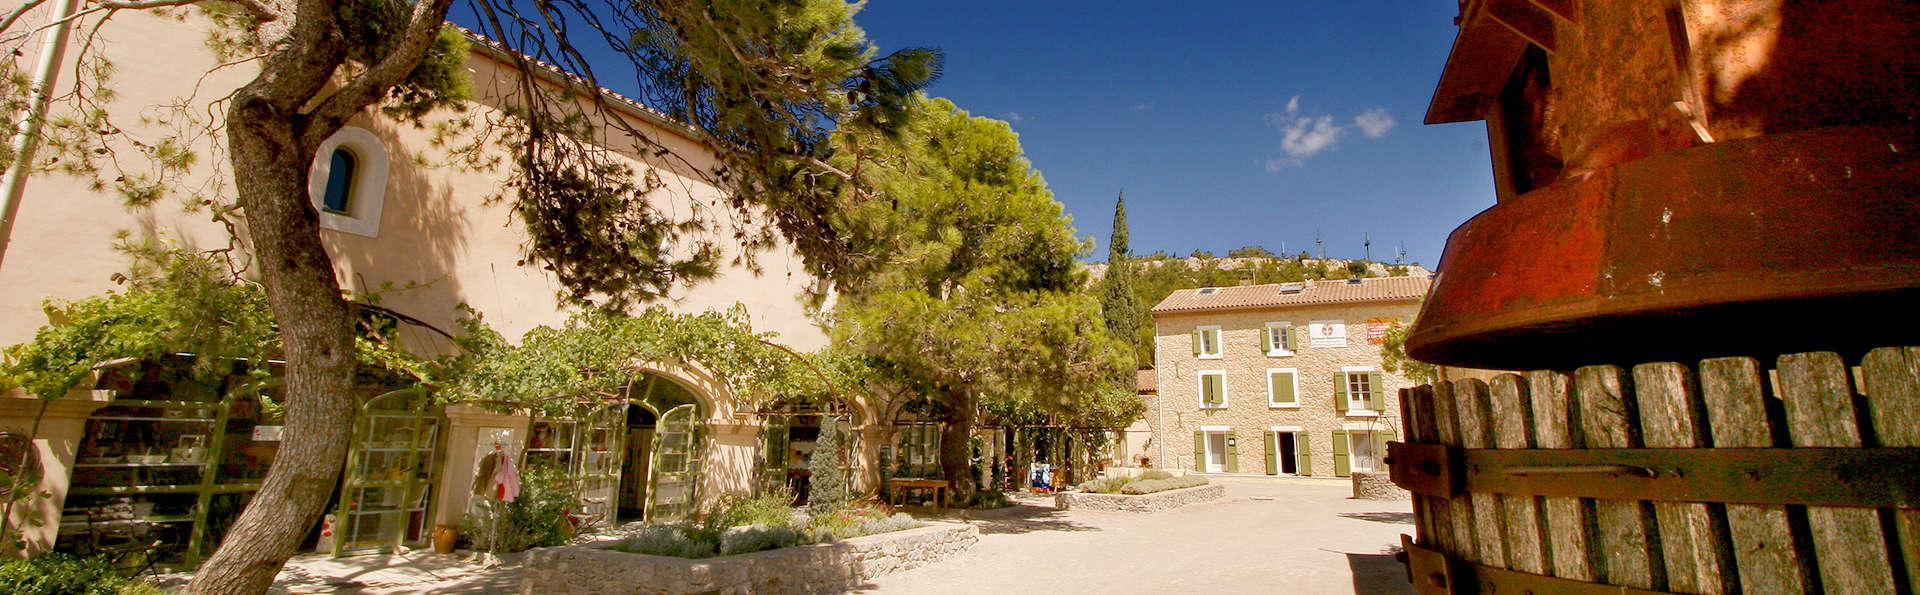 Château l'Hospitalet  - Edit_Front4.jpg